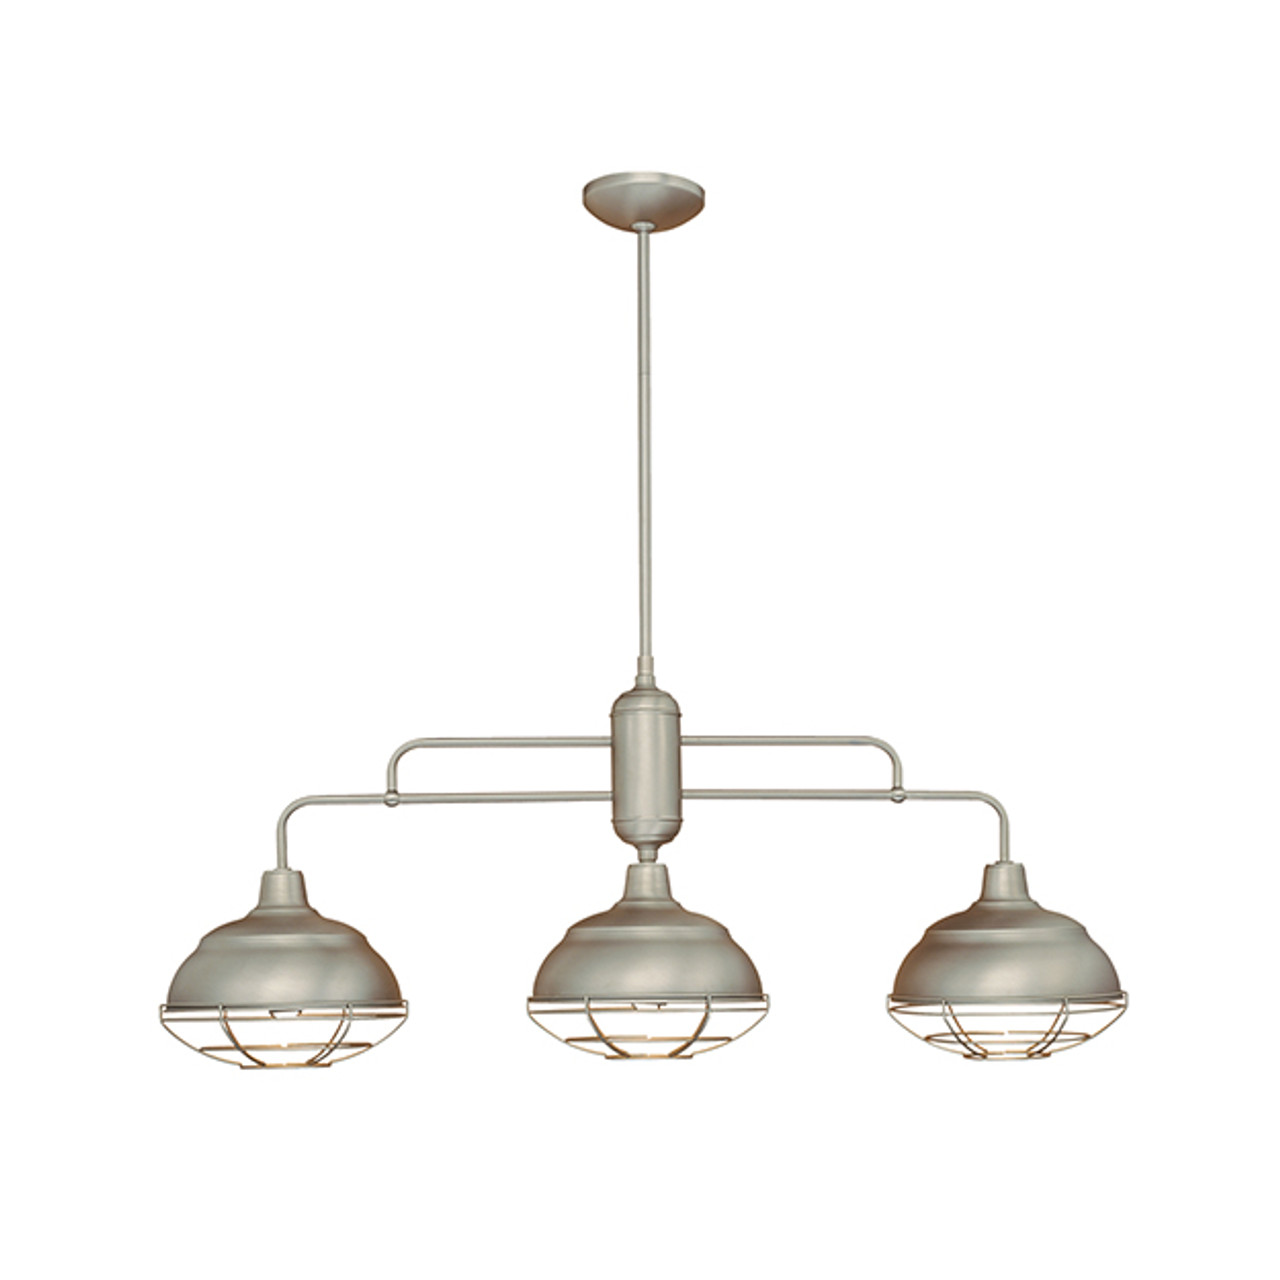 Millennium Lighting Neo-Industrial Vanity Light 5422-SN Satin Nickel